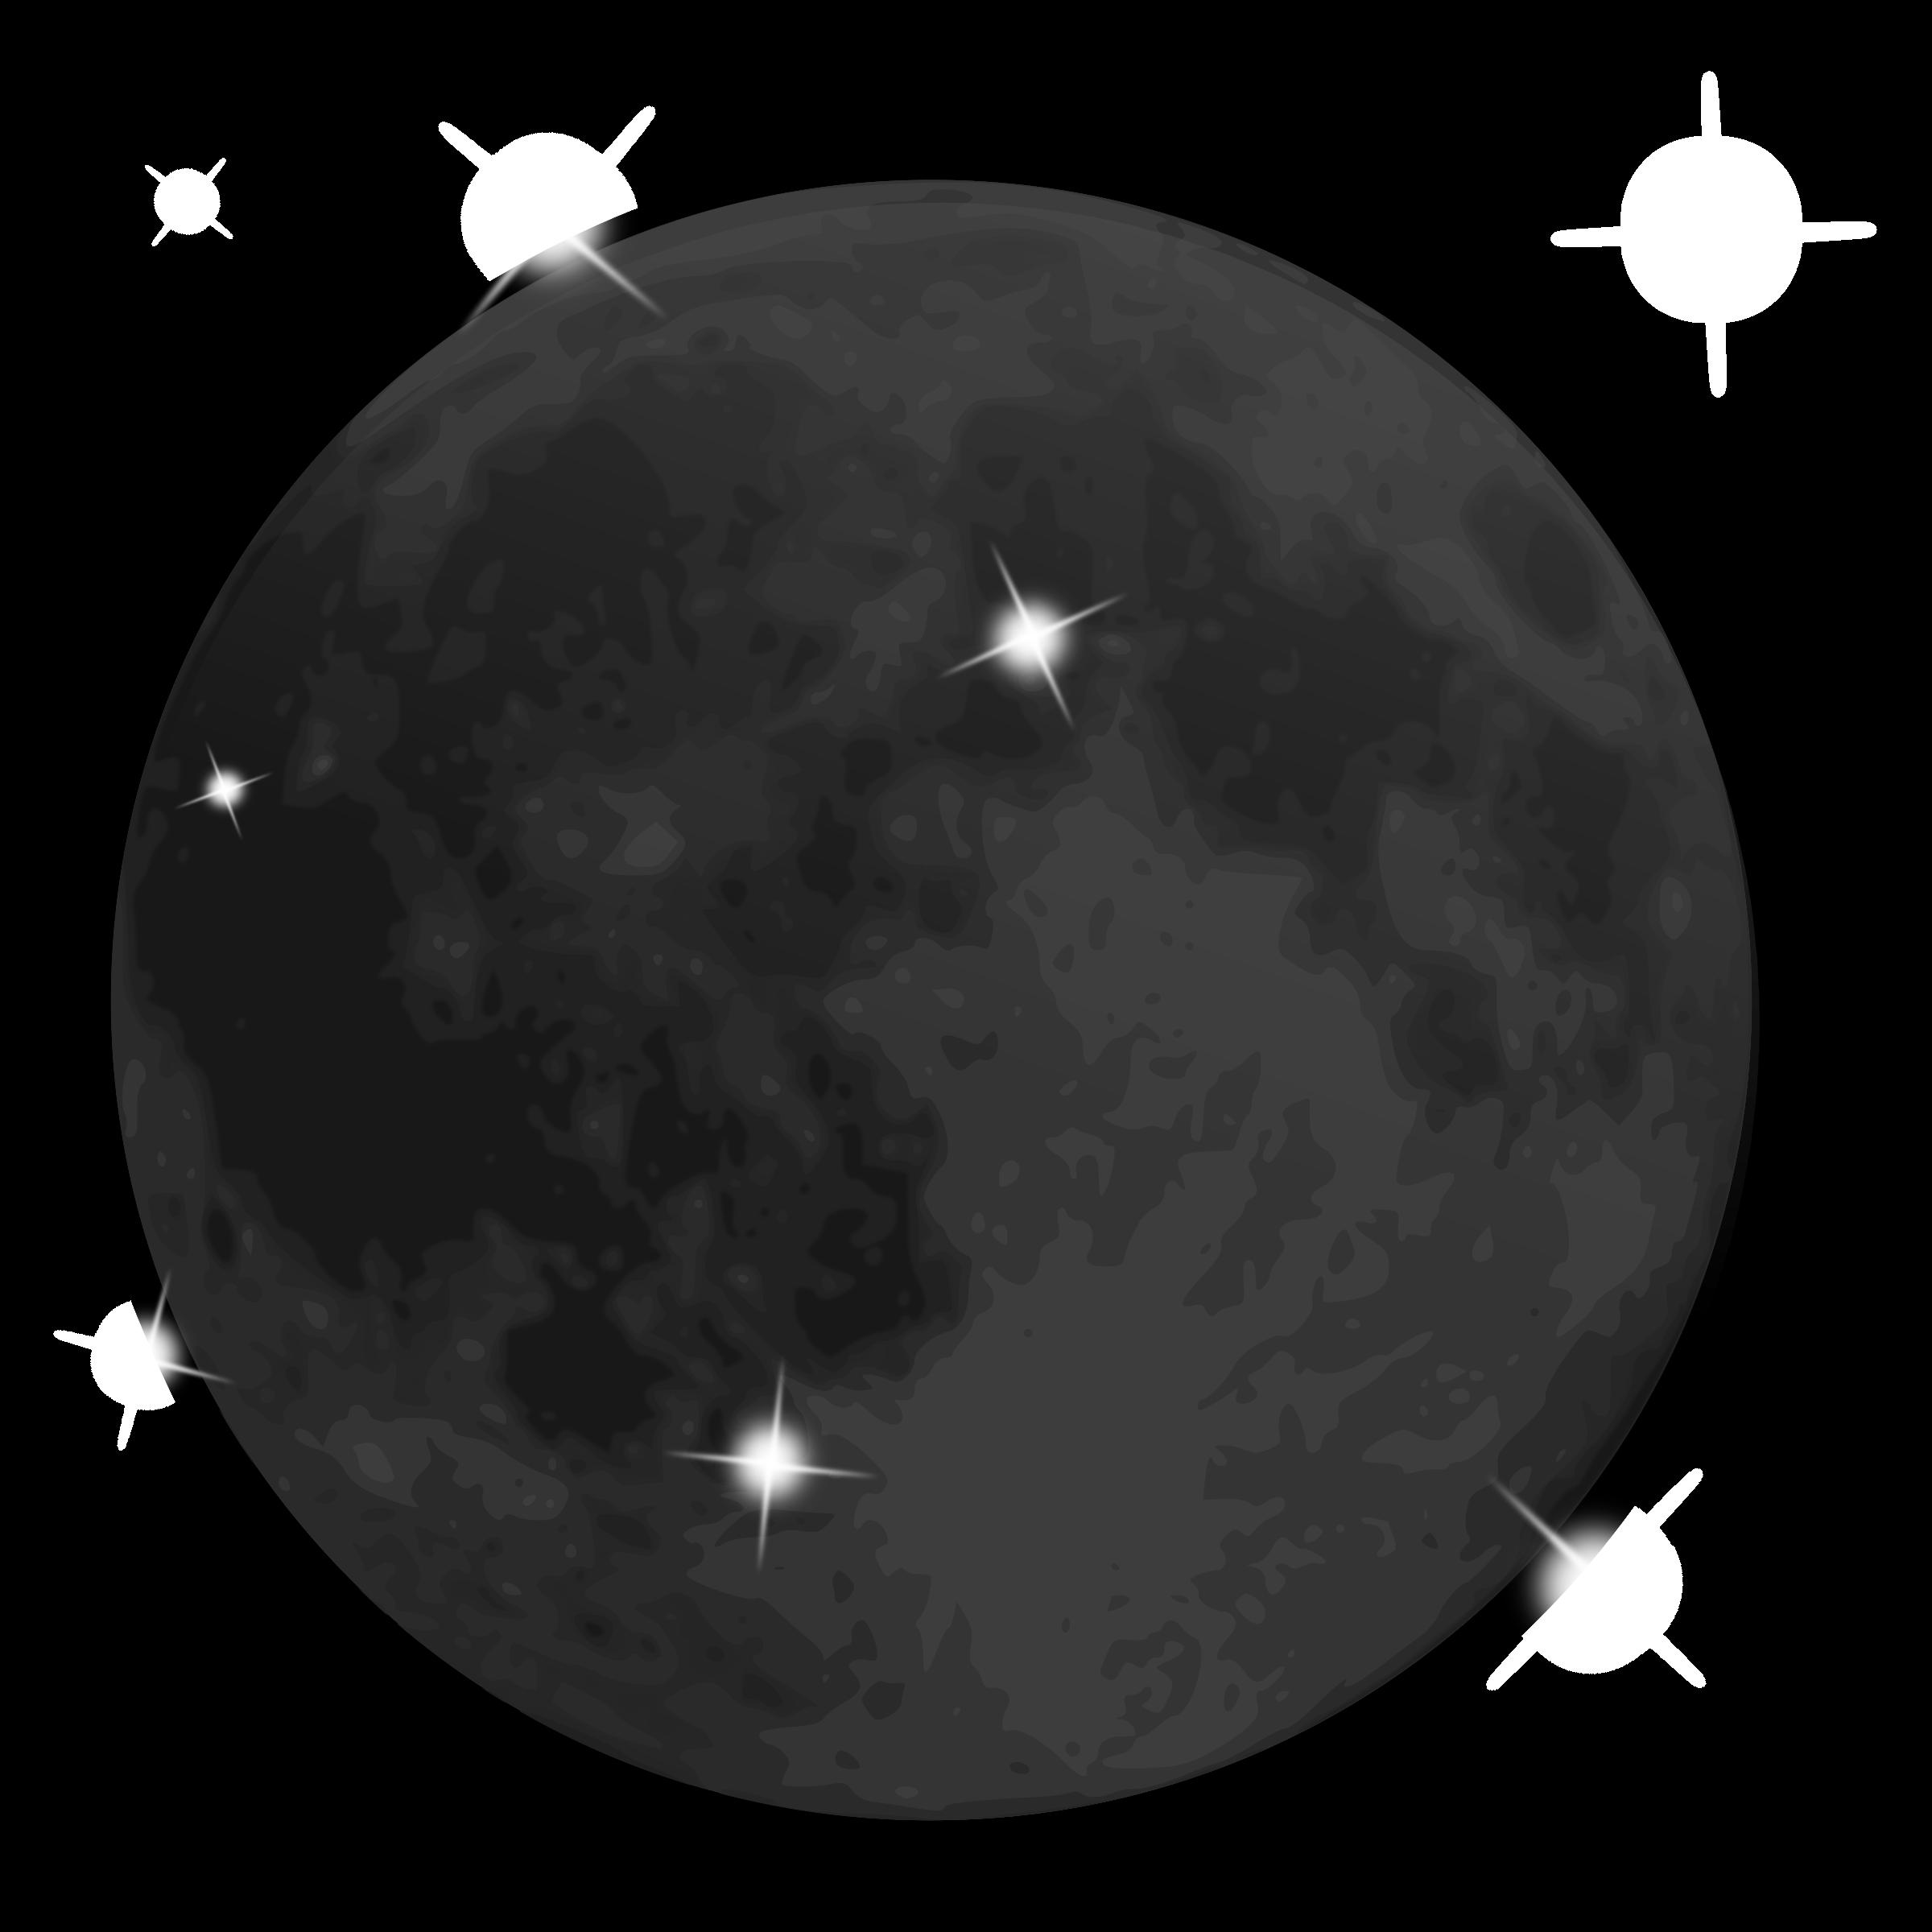 Moon Clip Art Free Images.